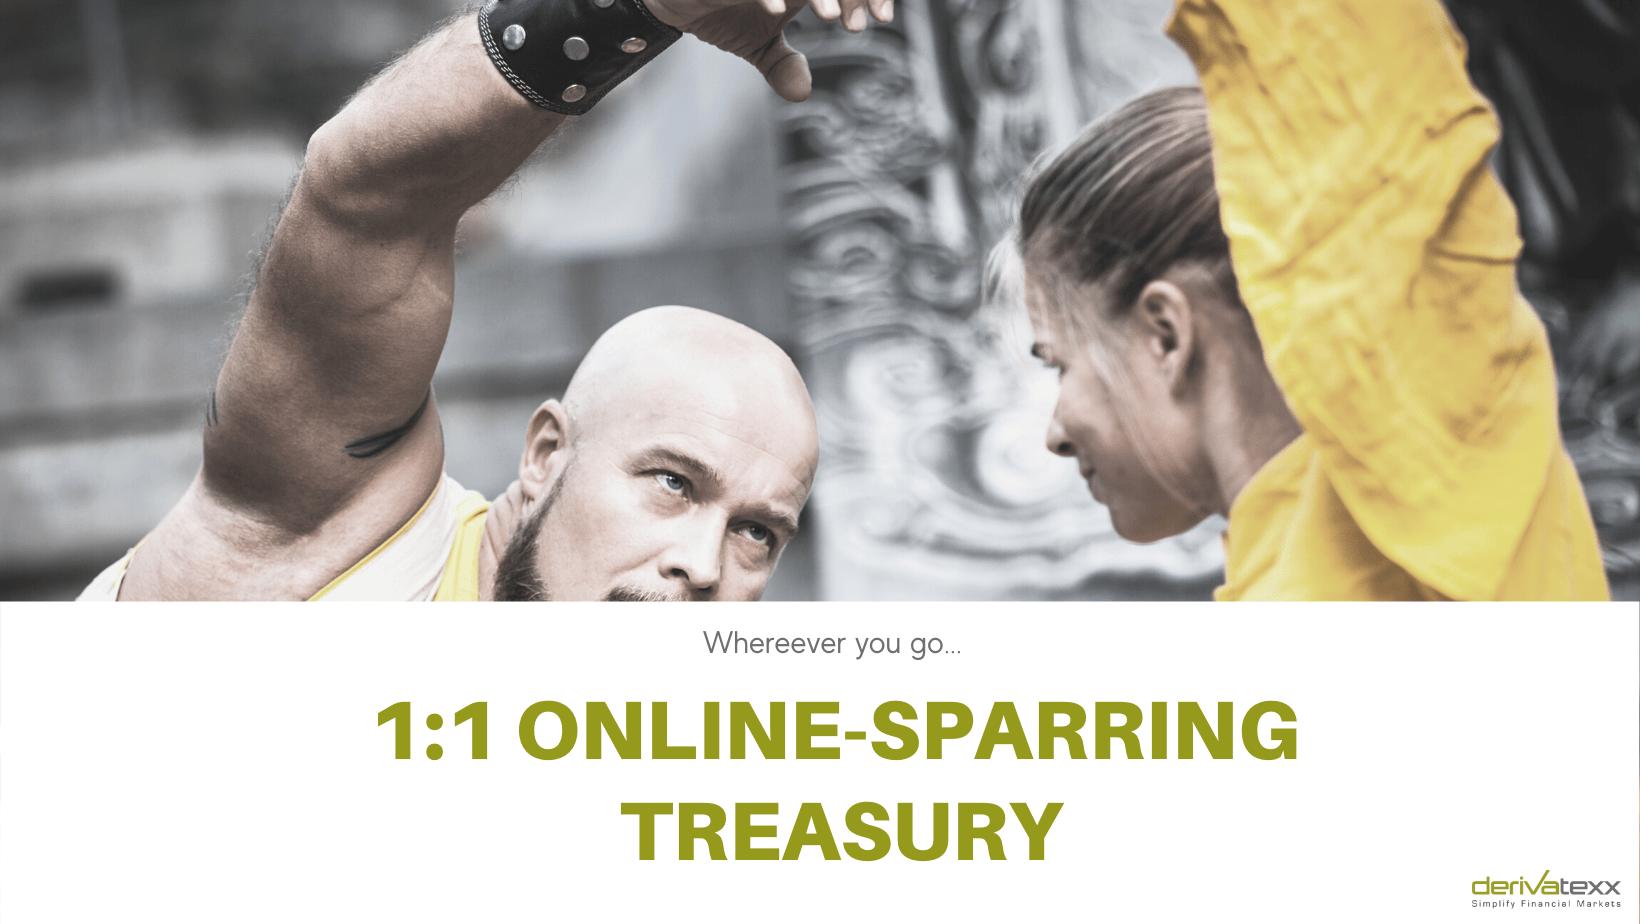 ONLINE-SPARRING TREASURY